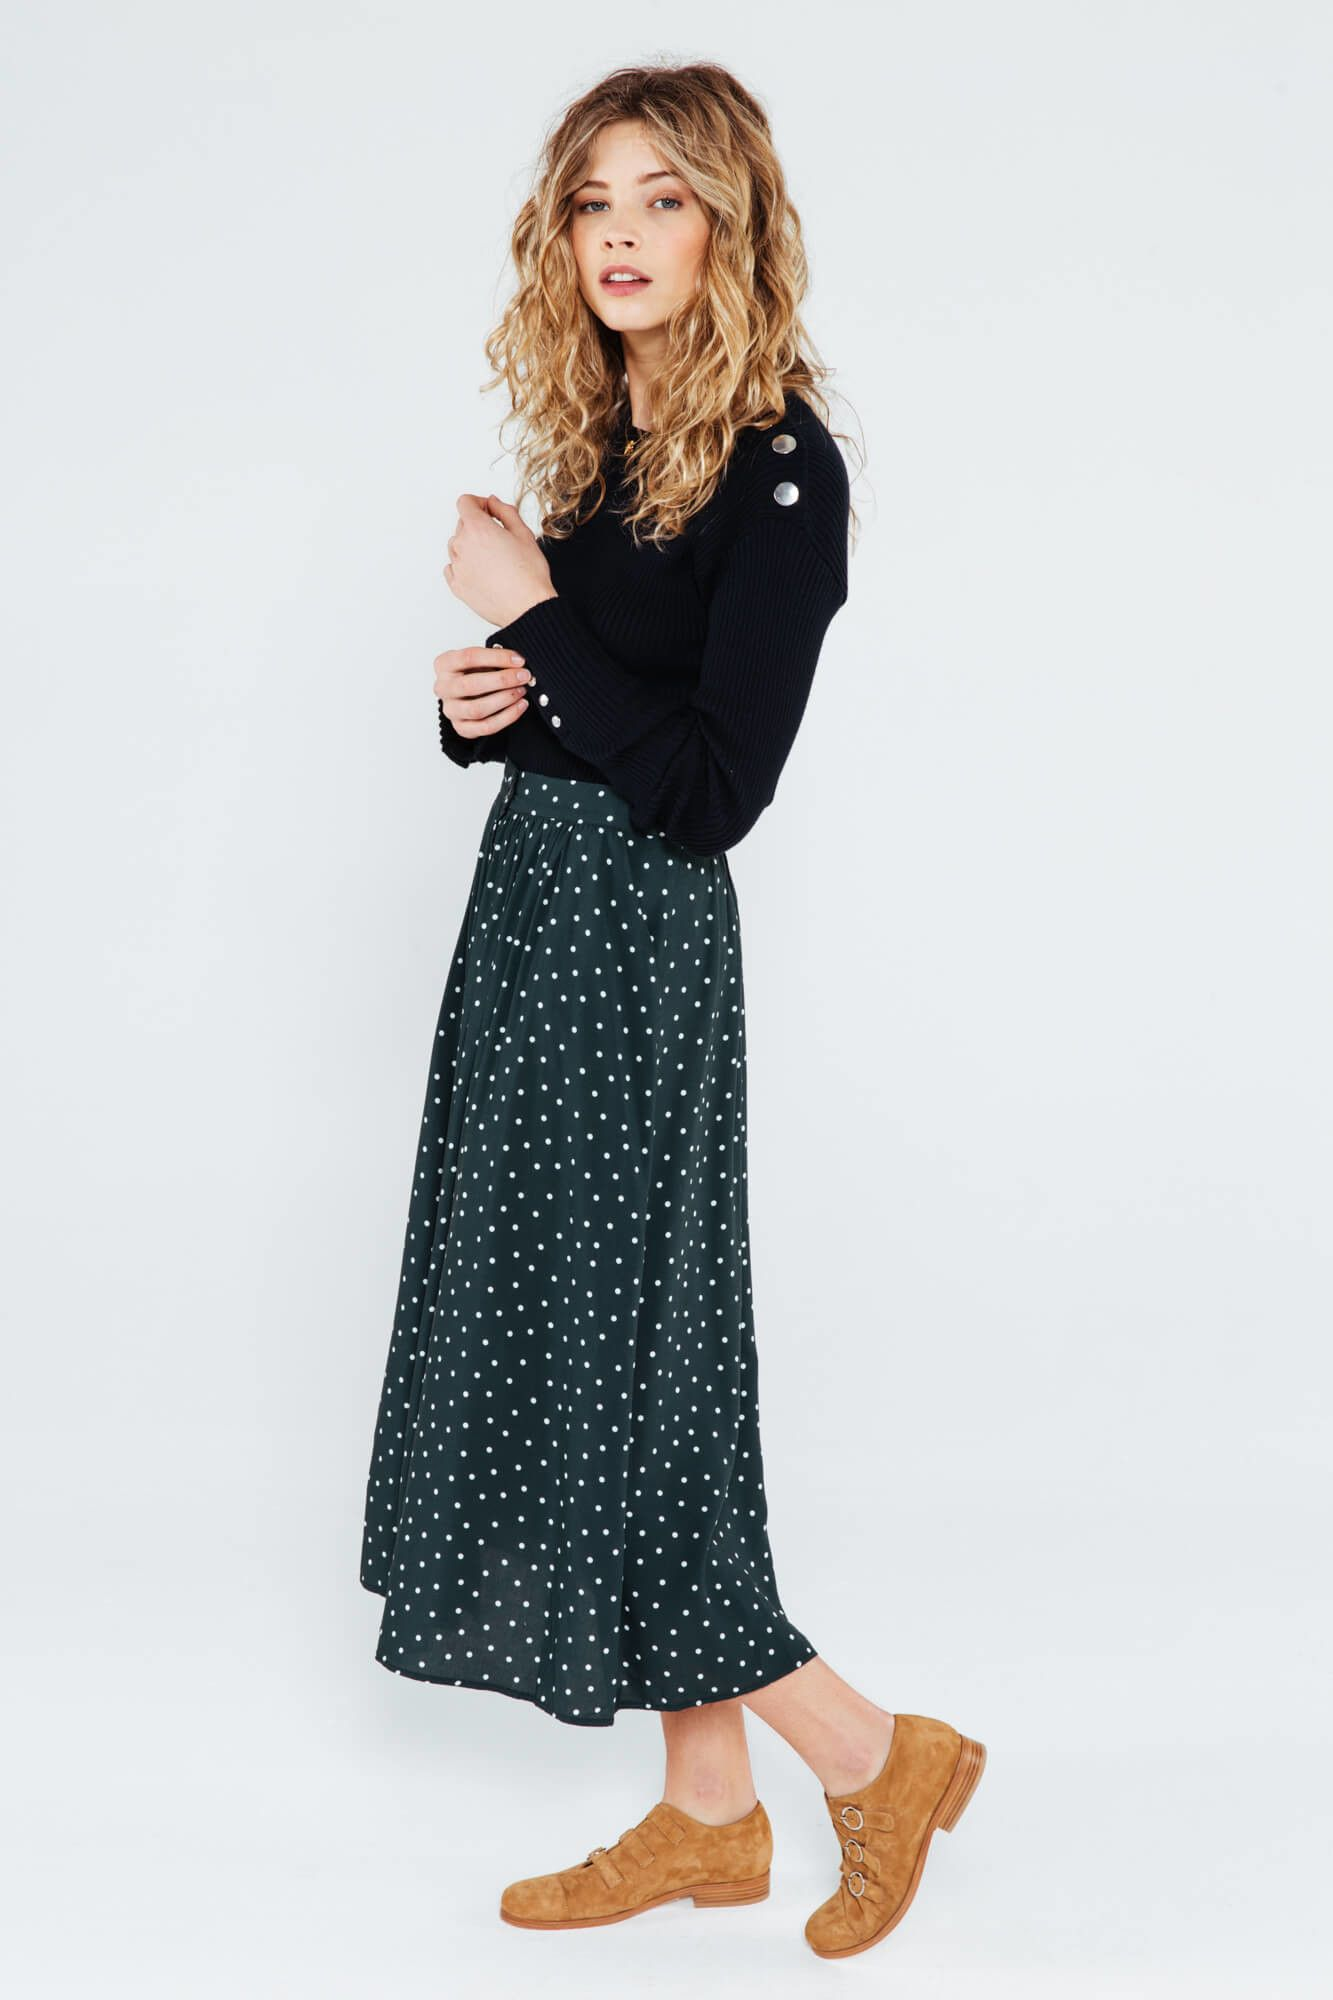 1c574af0da1997 jupe longue femme a pois vert   Style   Jupe longue femme, Jupes à ...